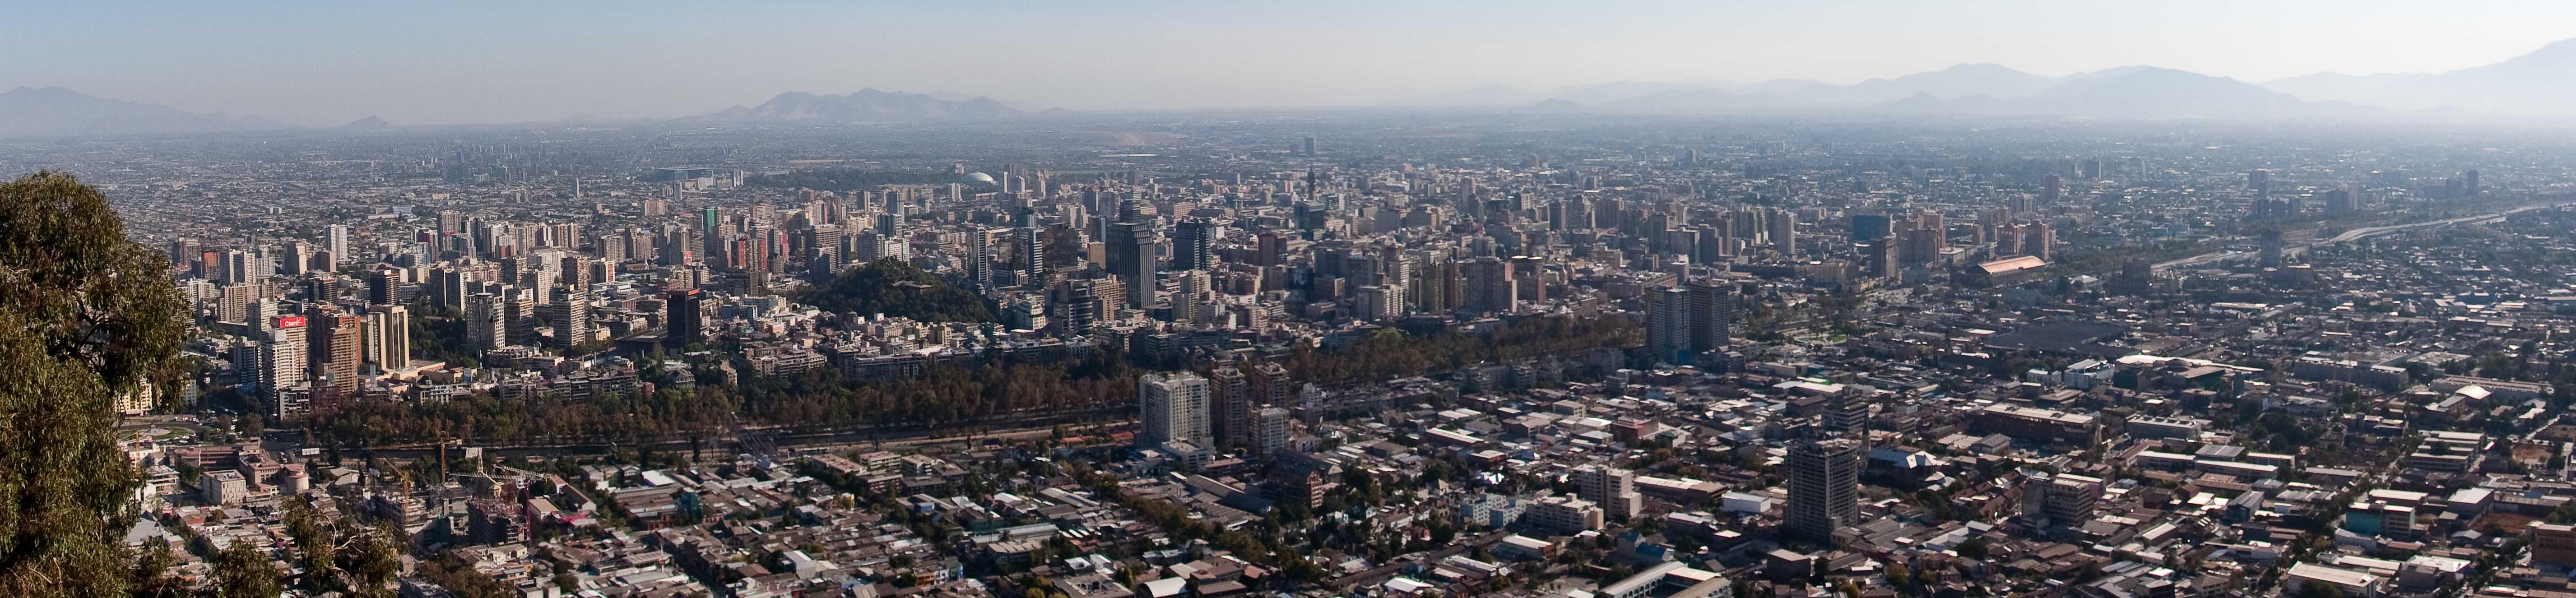 Panoramic view of Santiago from Cerro San Cristobal